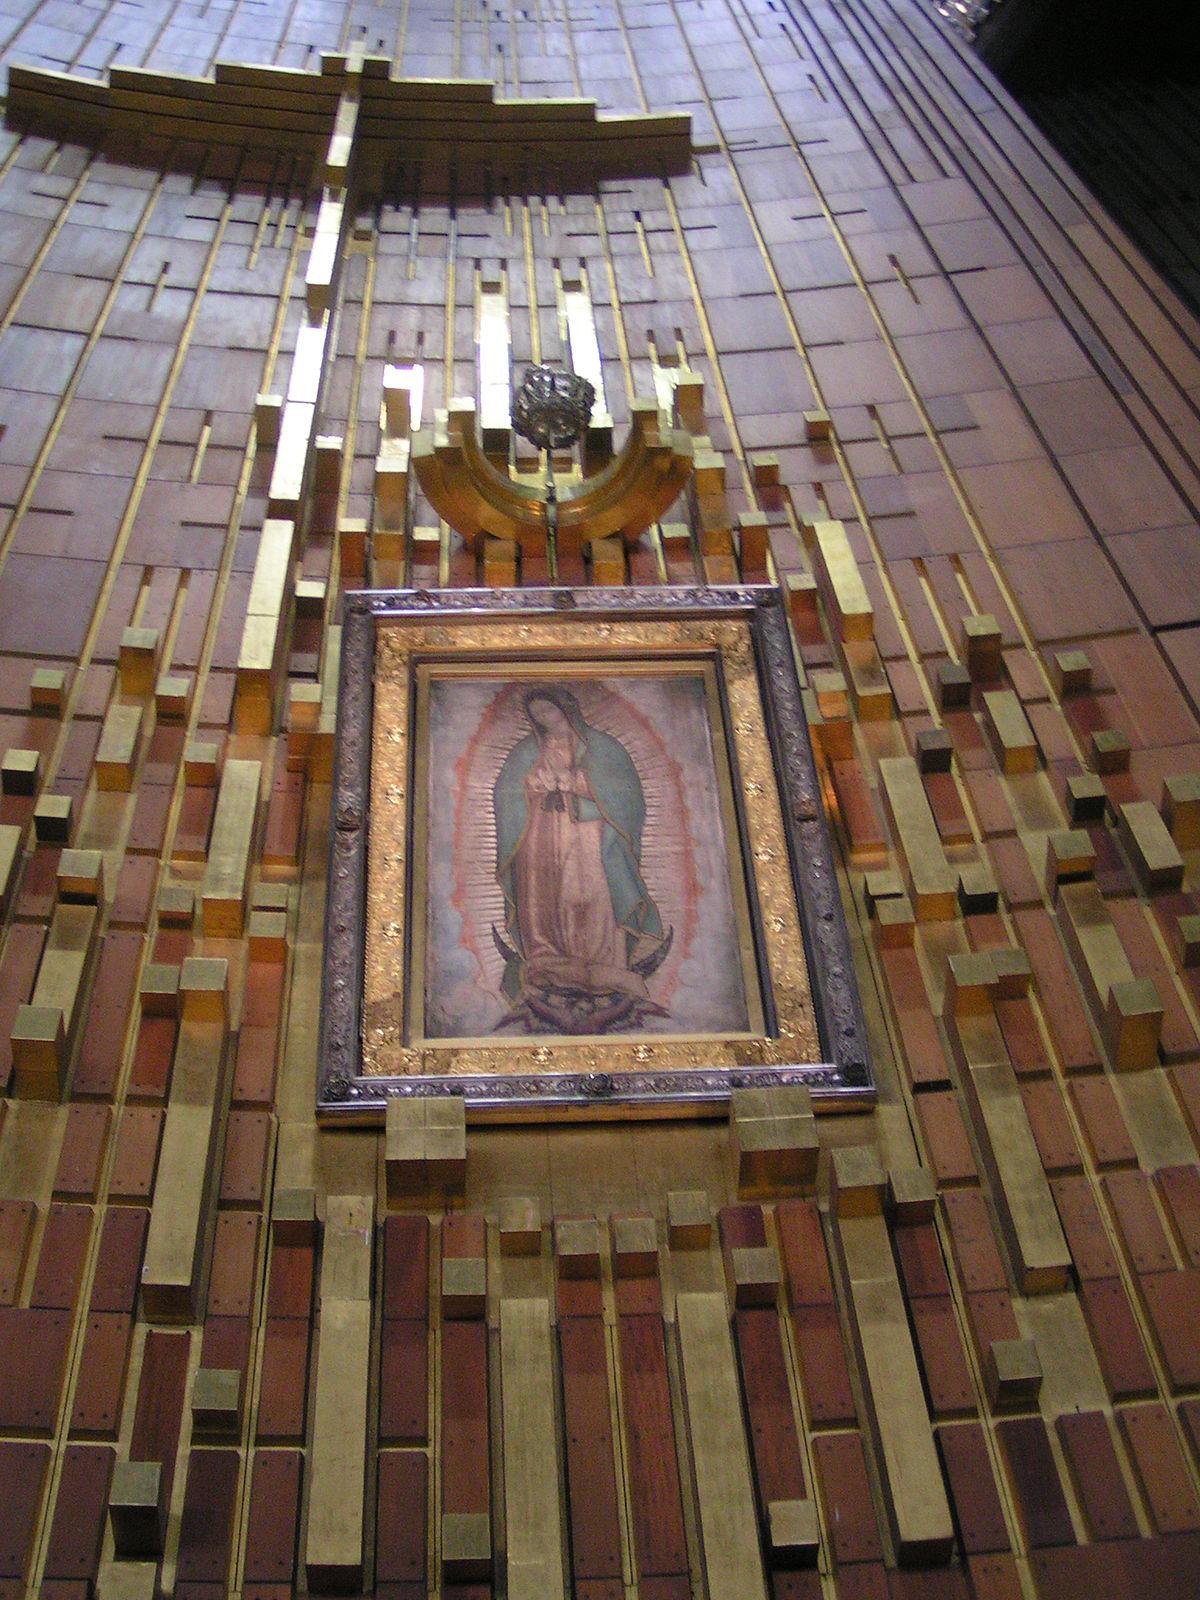 Nostra signora di guadalupe wikipedia - Images of la virgen de guadalupe ...